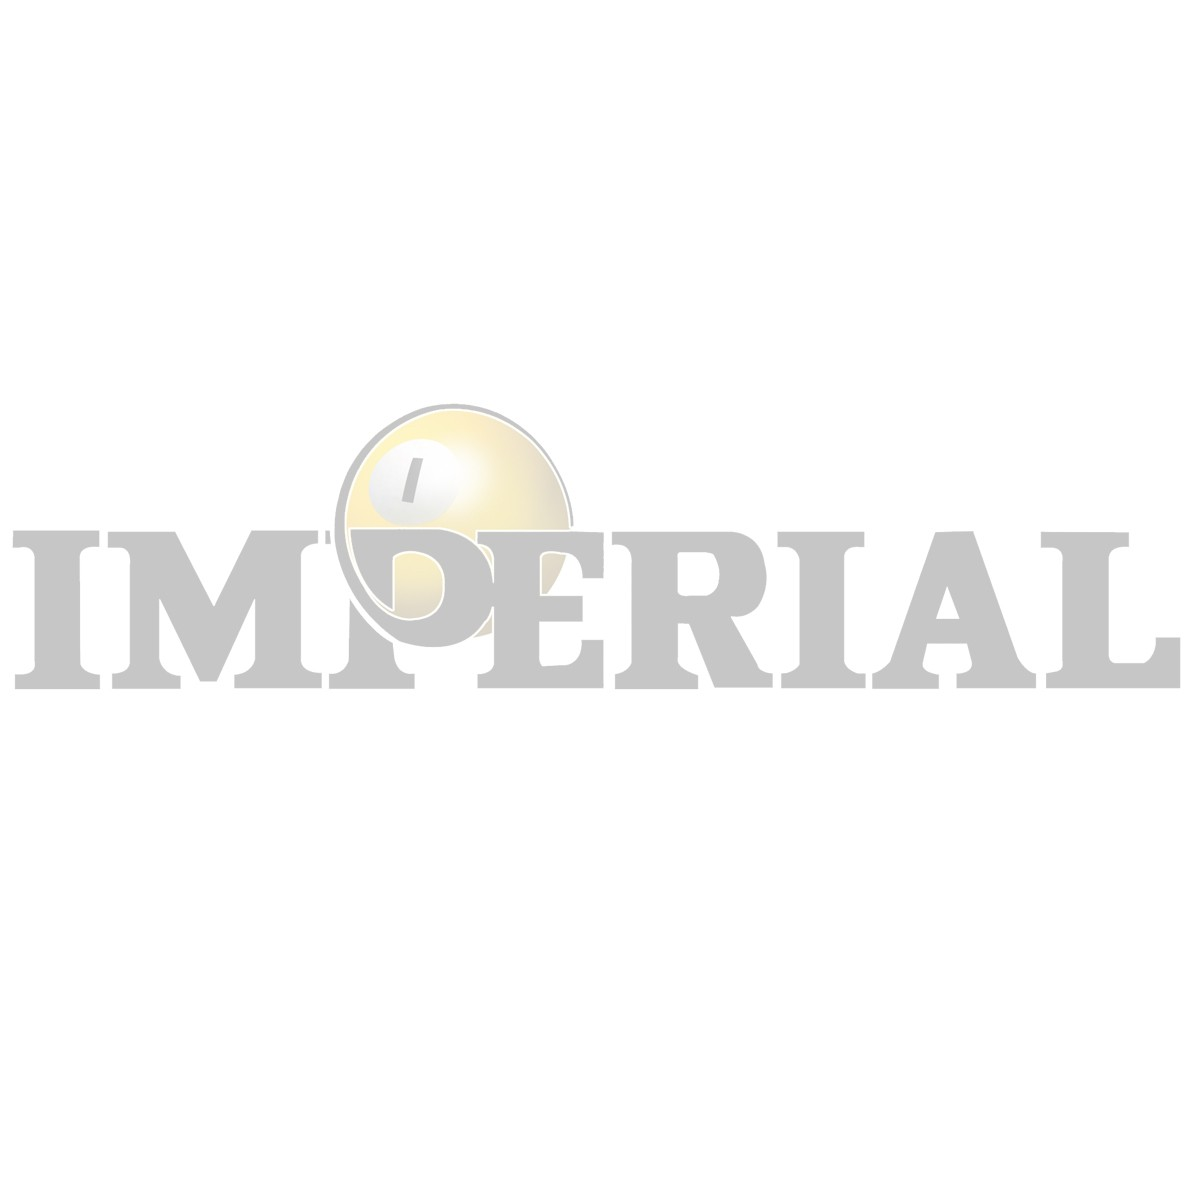 University of Alabama Home vs. Away Billiard Ball Set